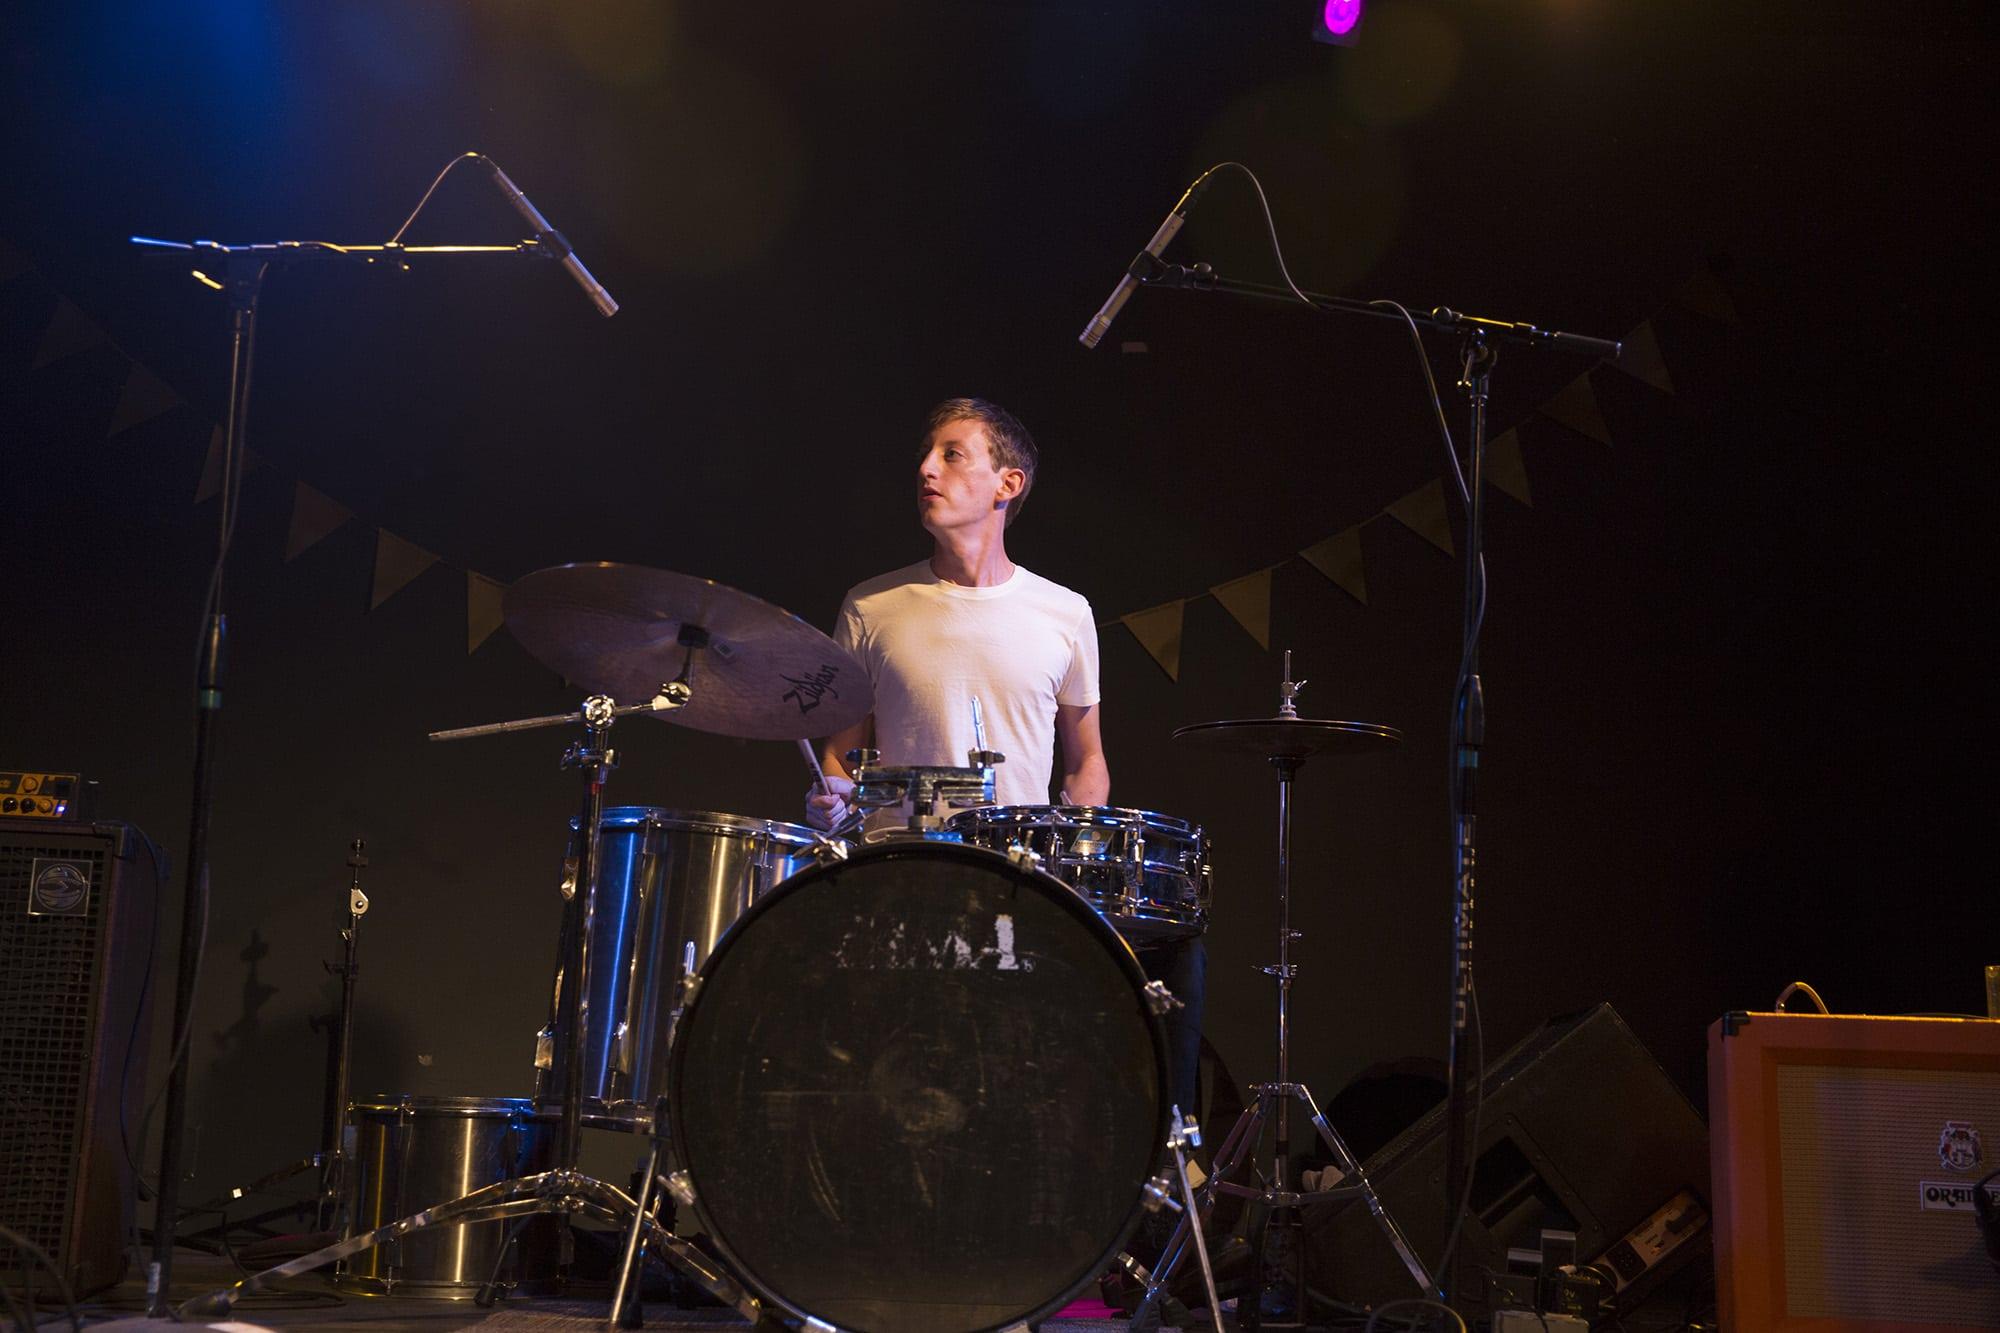 Lvl Up performing at Schine Underground,Syracuse University. 09/28/17